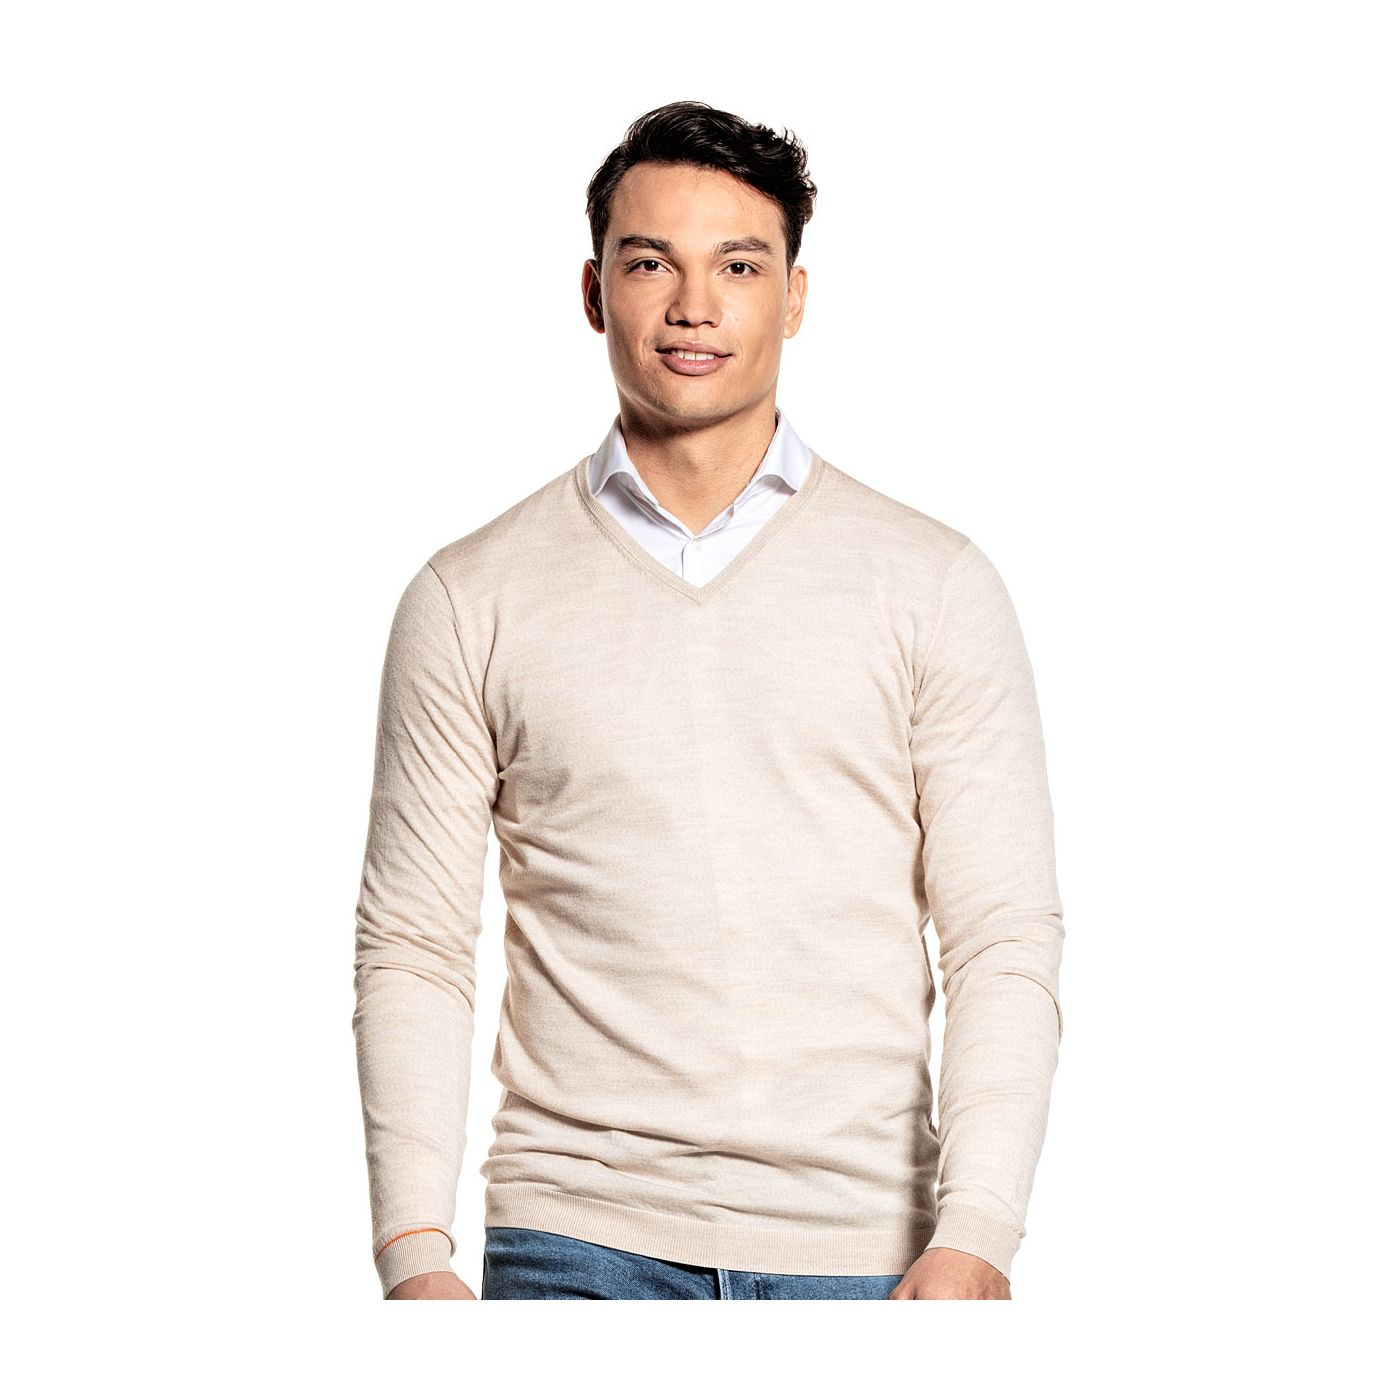 Extra long V Neck sweater for men made of Merino wool in Beige